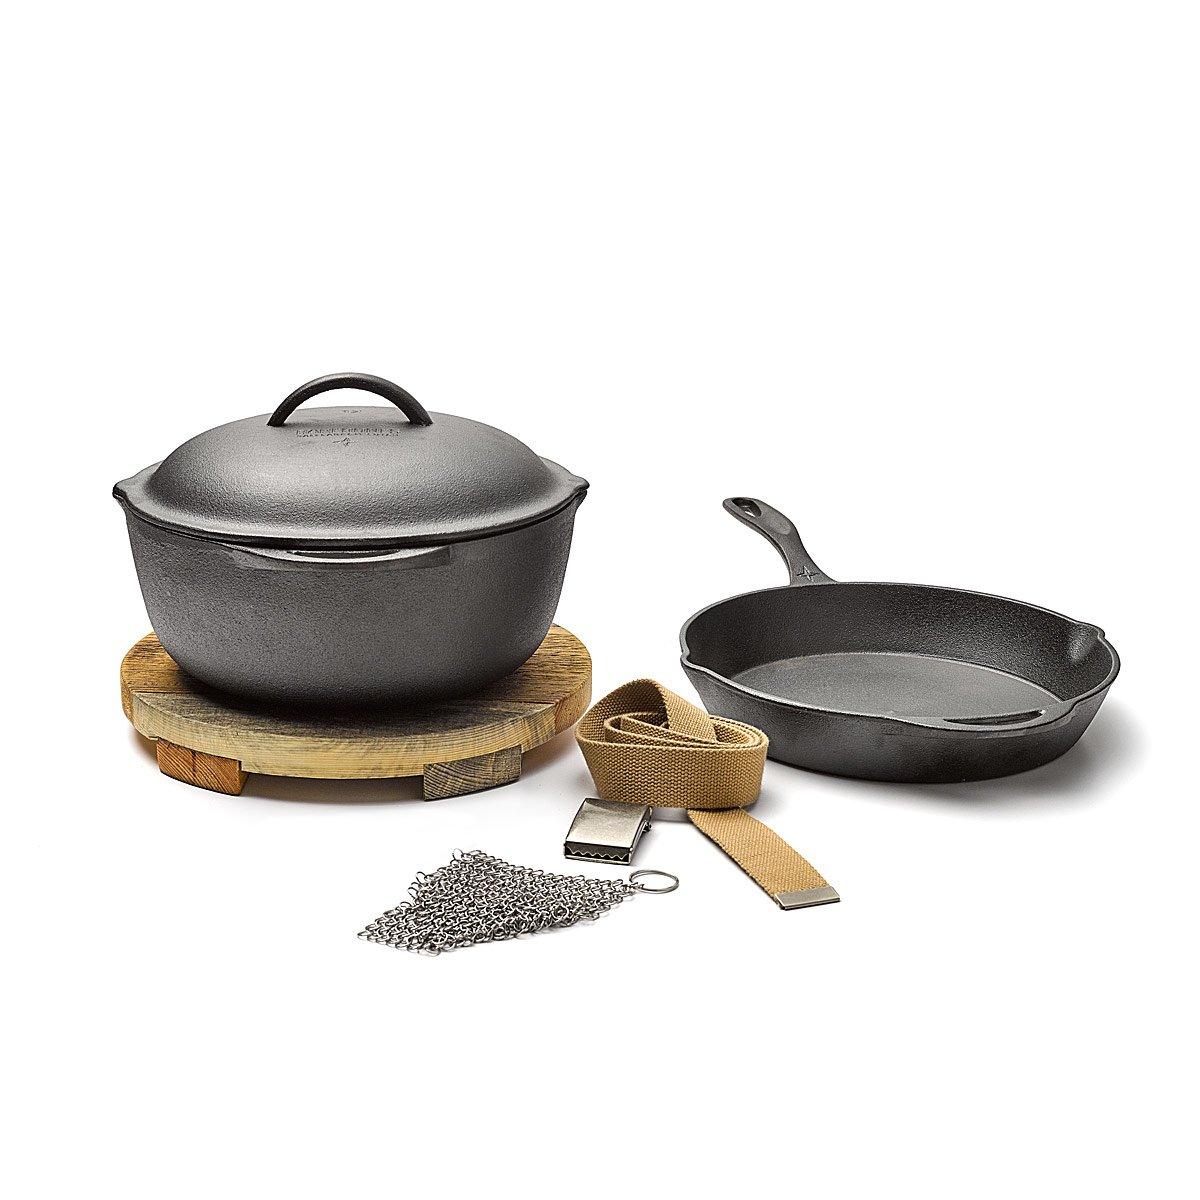 Cast iron kitchen trivet tea pot stand metal hot dish tray cookware - Cast Iron Cooking Set